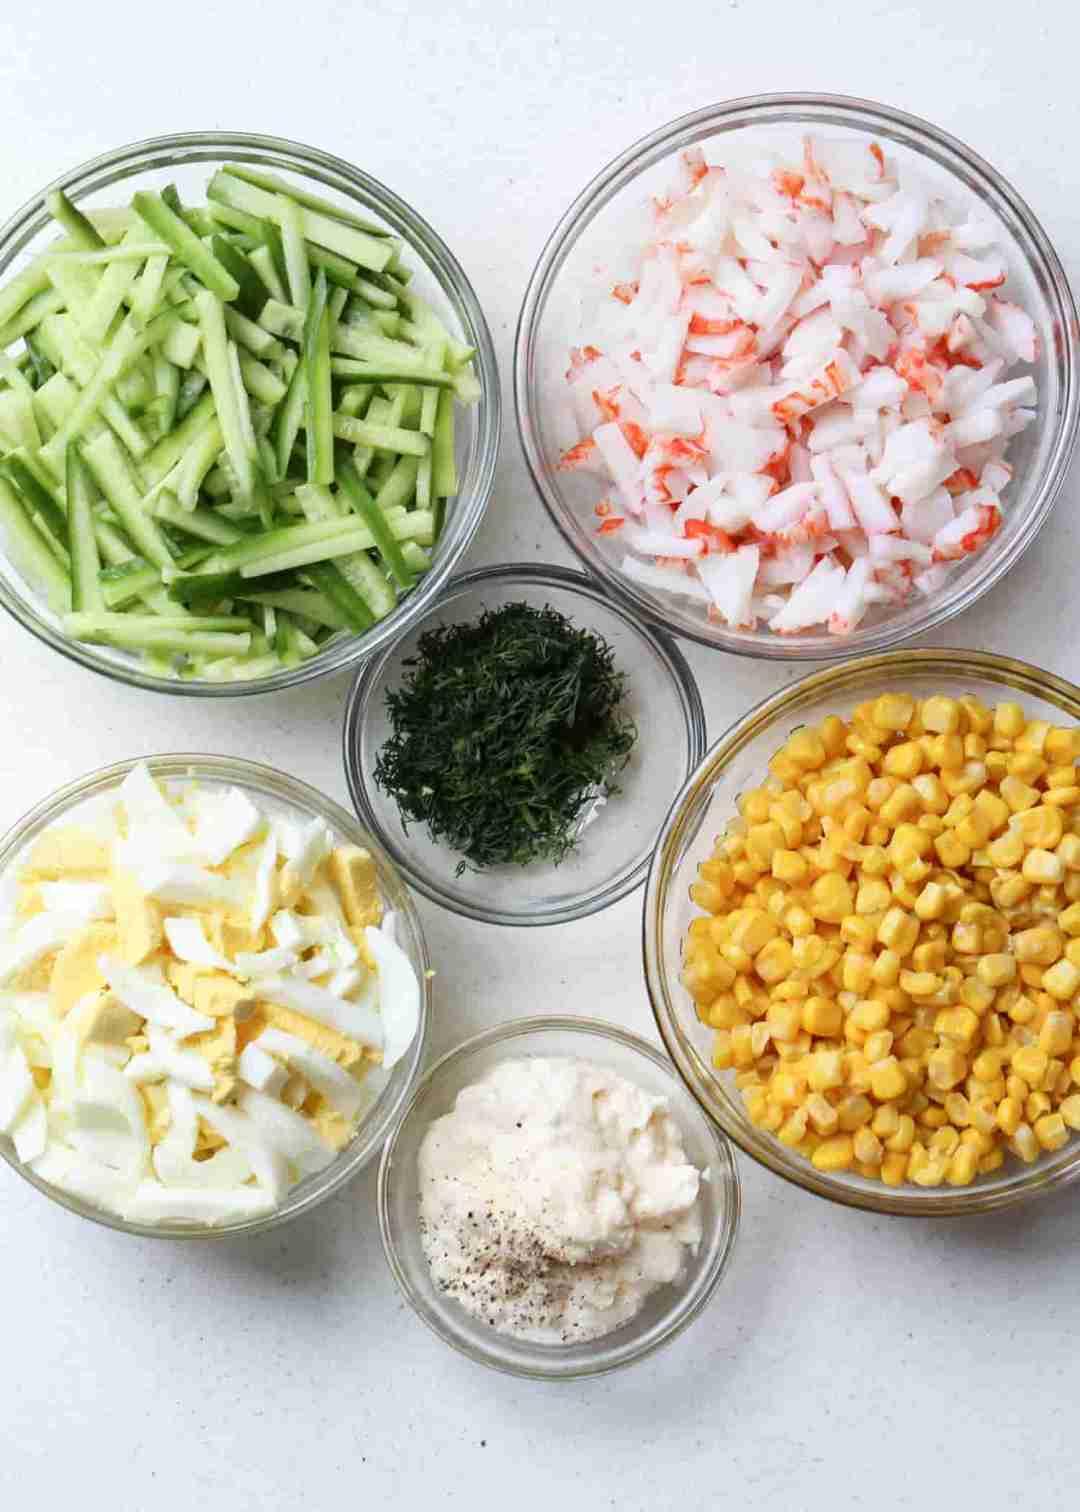 Ingredients for crab corn egg salad.